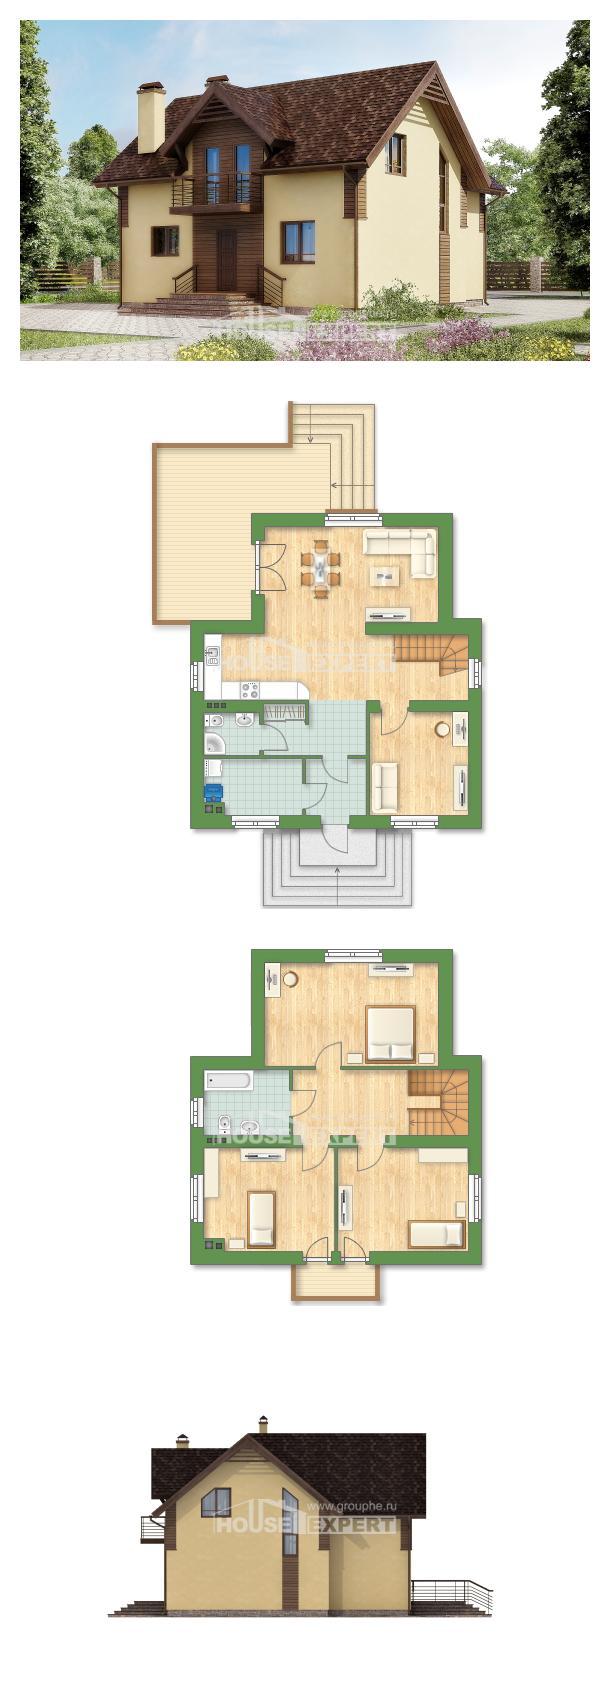 Проект дома 150-009-Л   House Expert